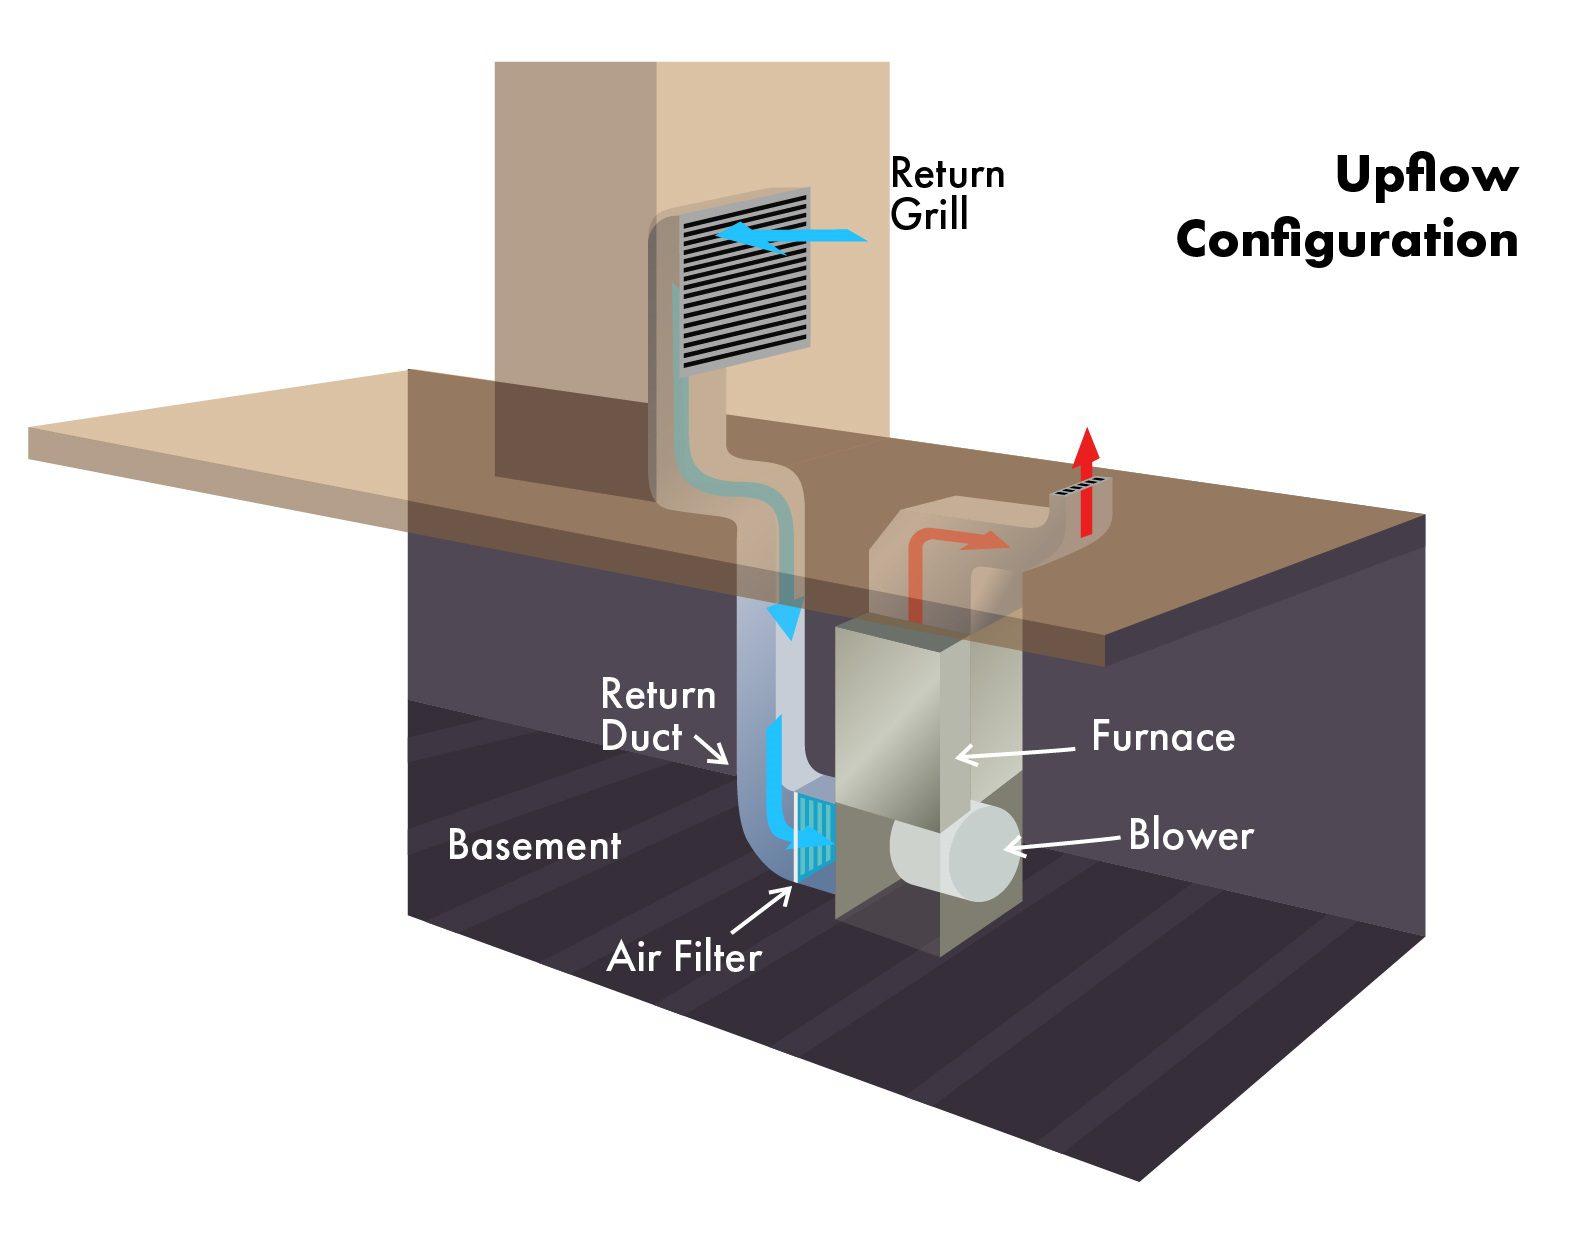 Diagram Upflow configuration filter at return duct outside of furnace, Diagram, Upflow, configuration, filter, return duct, outside, furnace